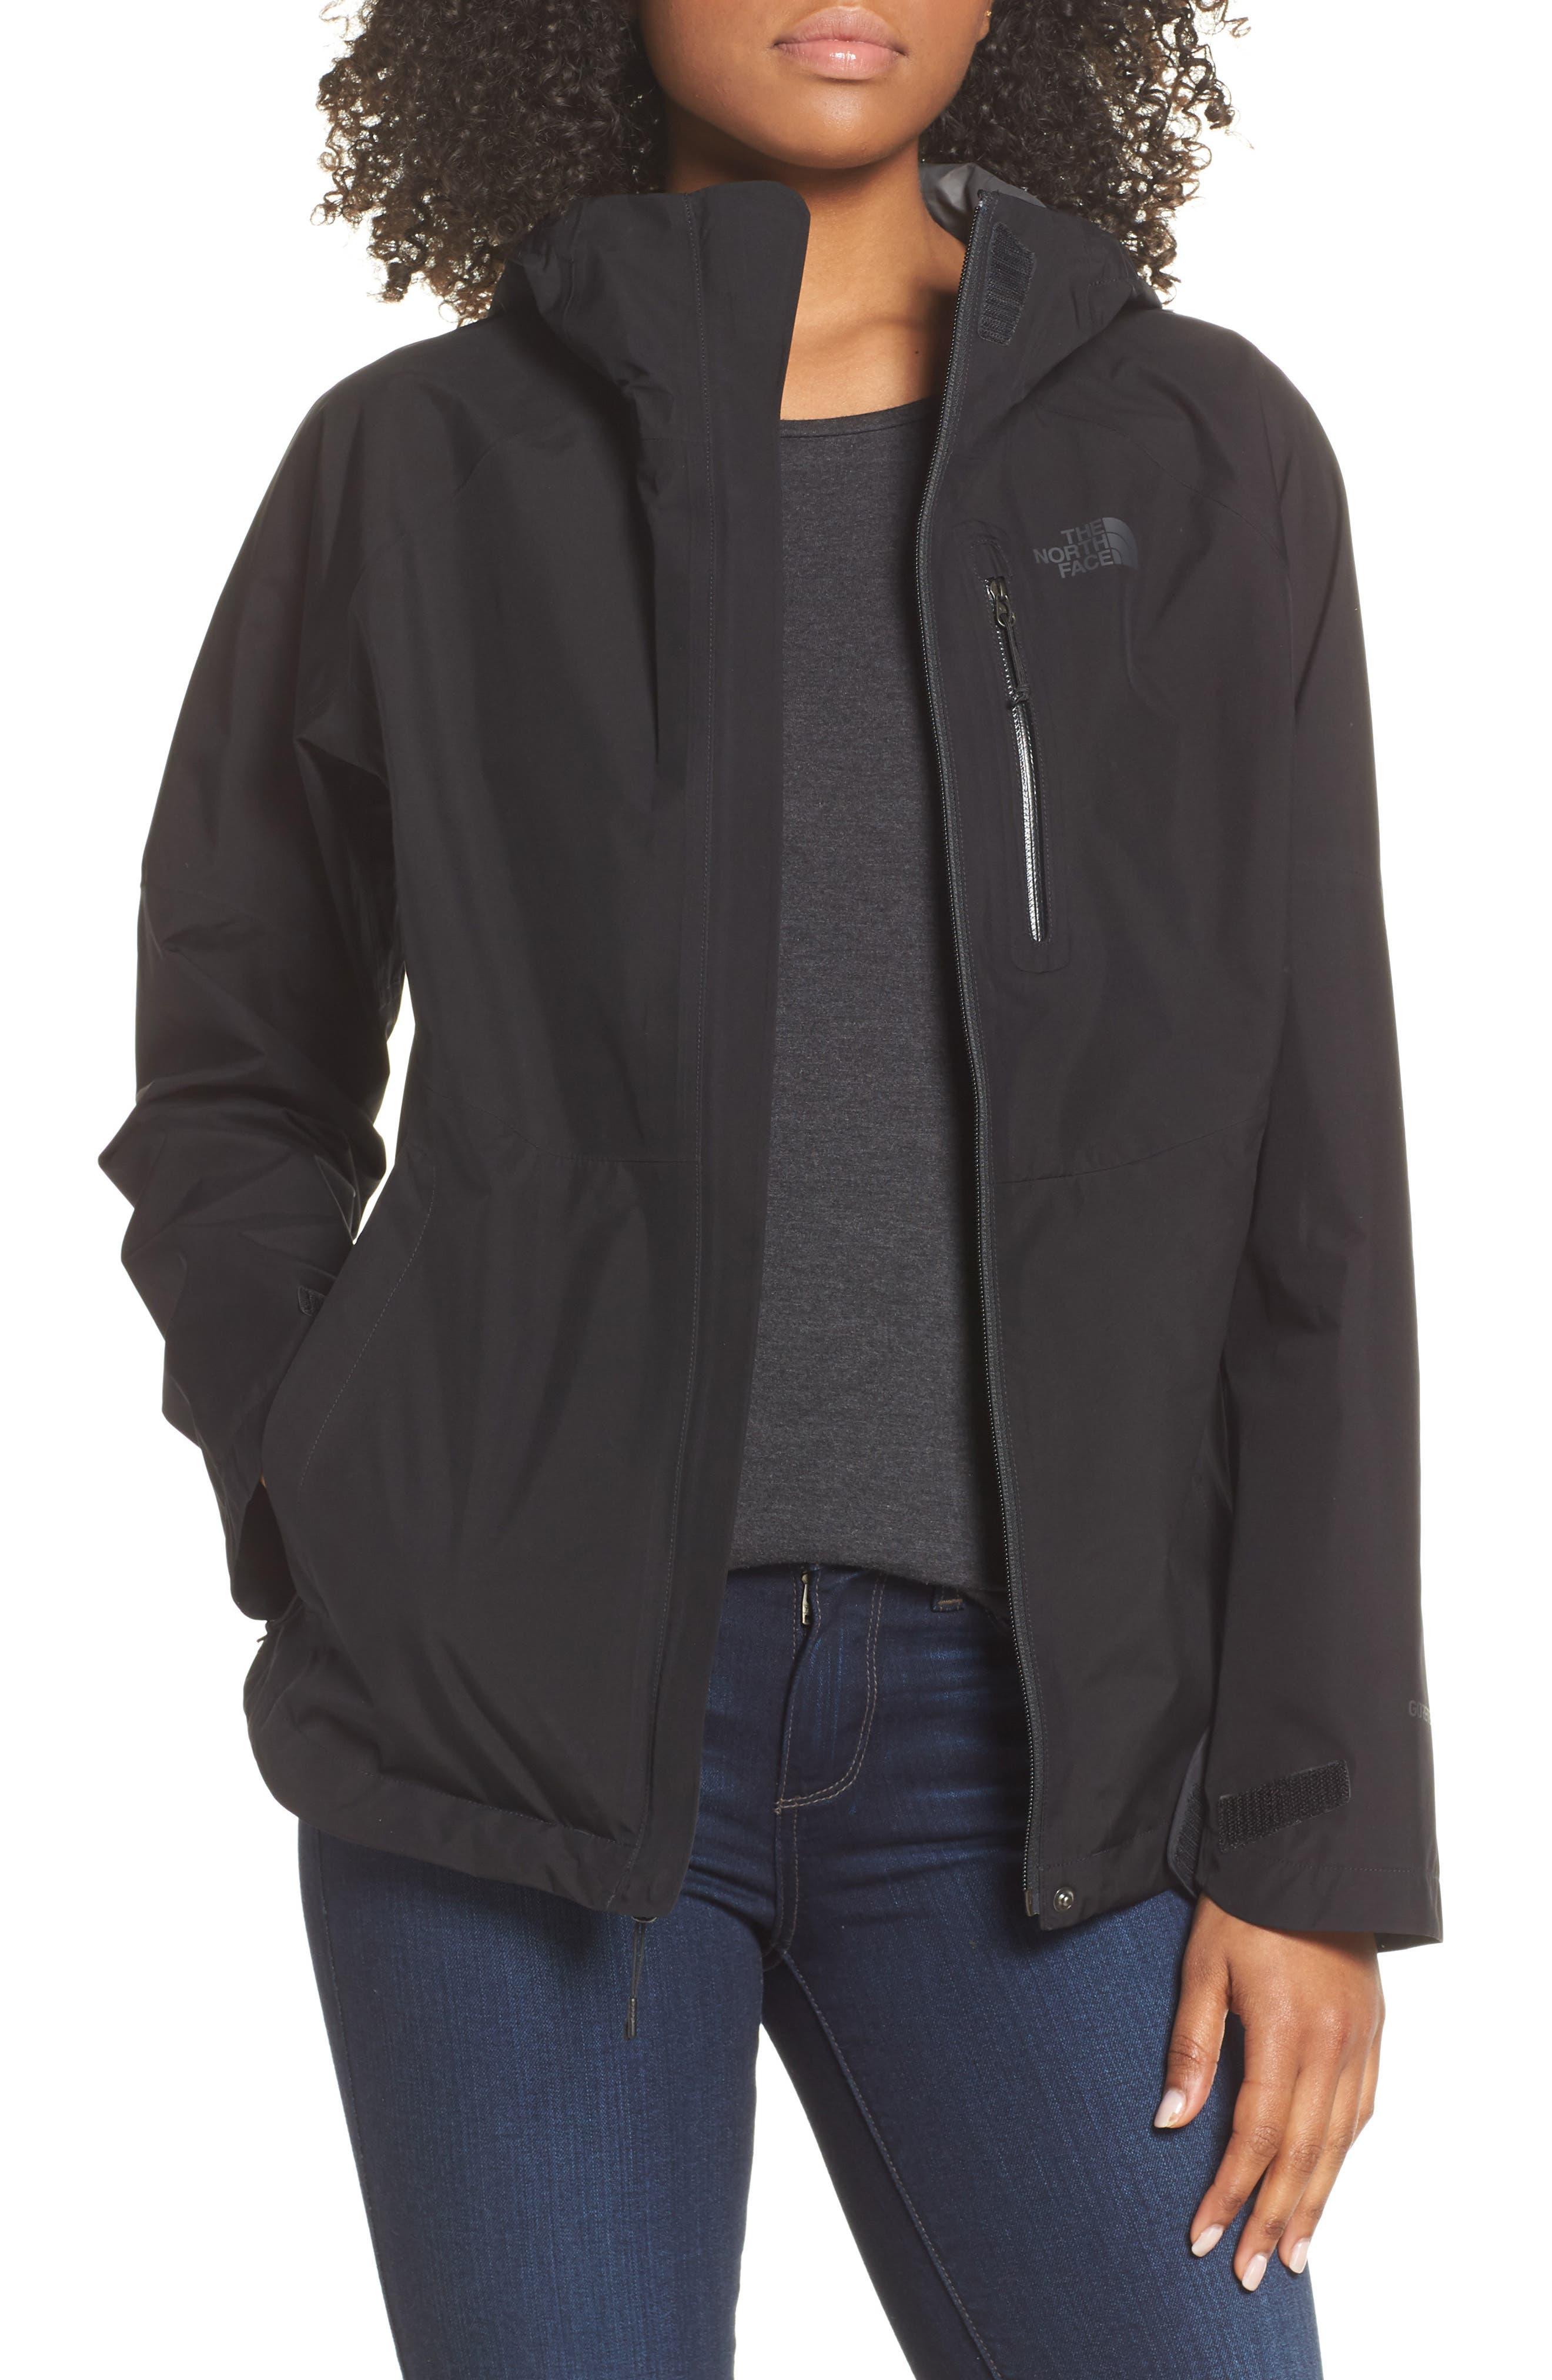 THE NORTH FACE Dryzzle Hooded Rain Jacket, Main, color, TNF BLACK